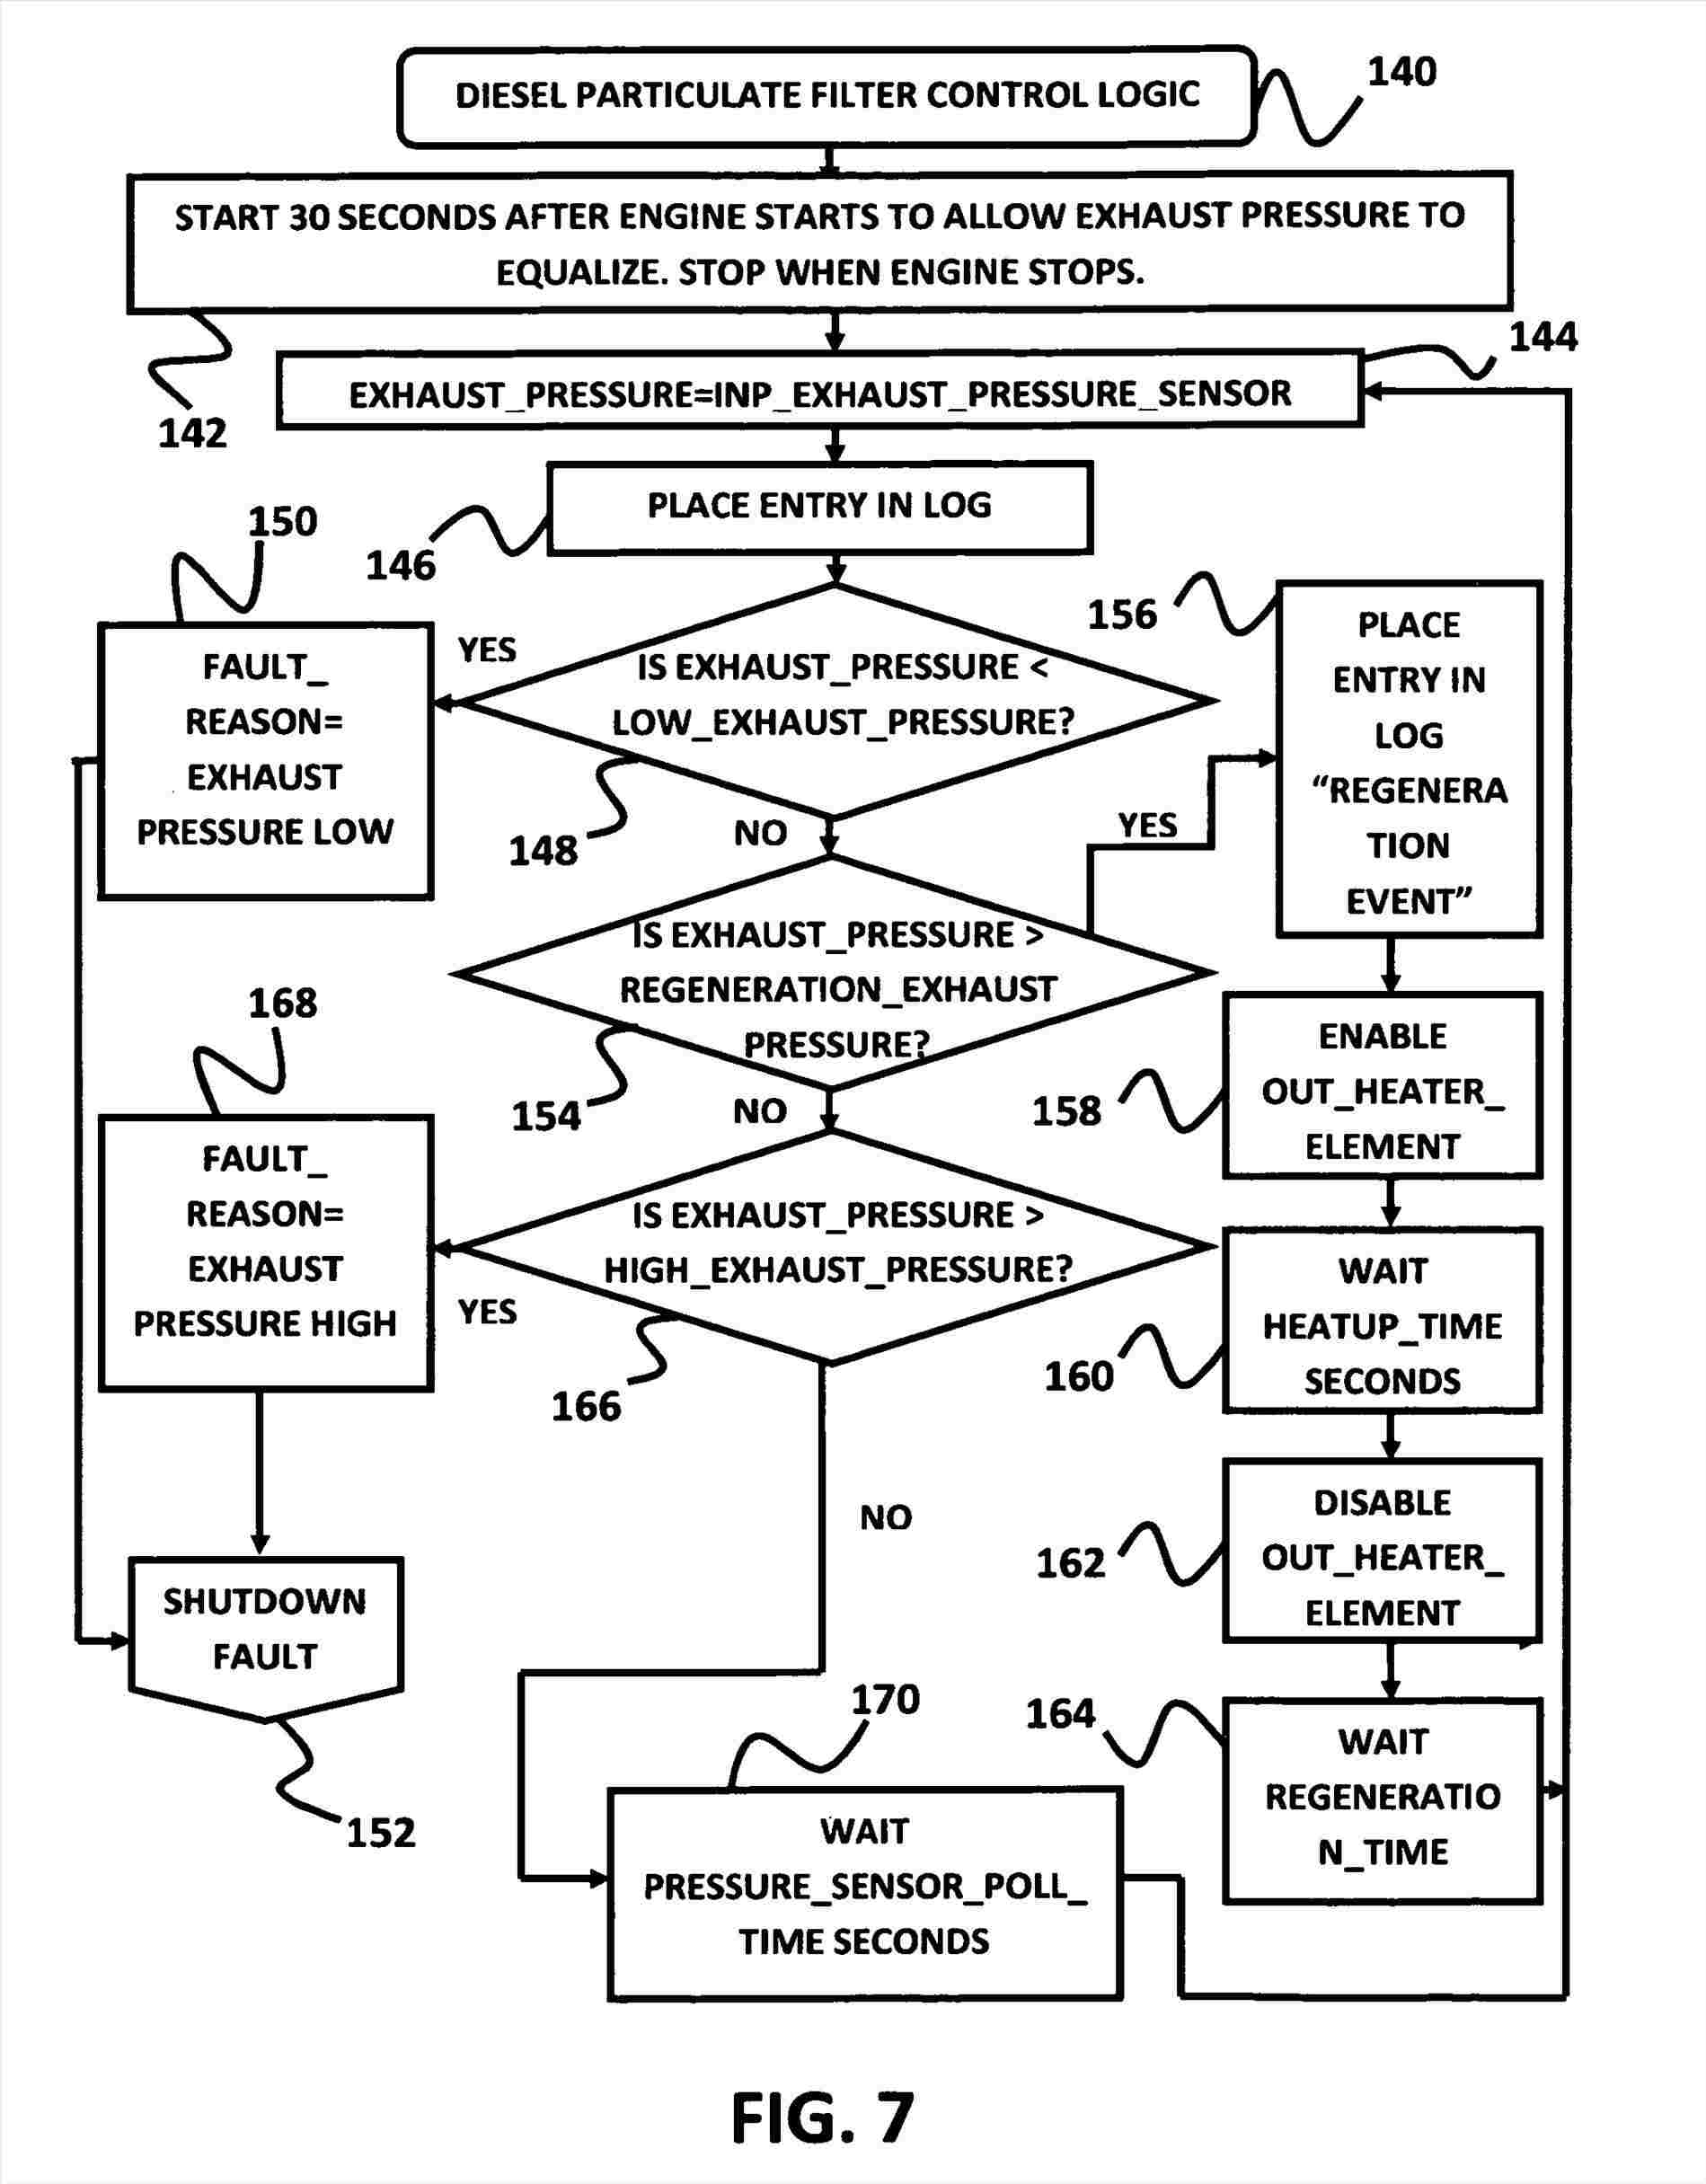 Tripac Apu Wiring Diagram | Wiring Diagram - Tripac Apu Wiring Diagram